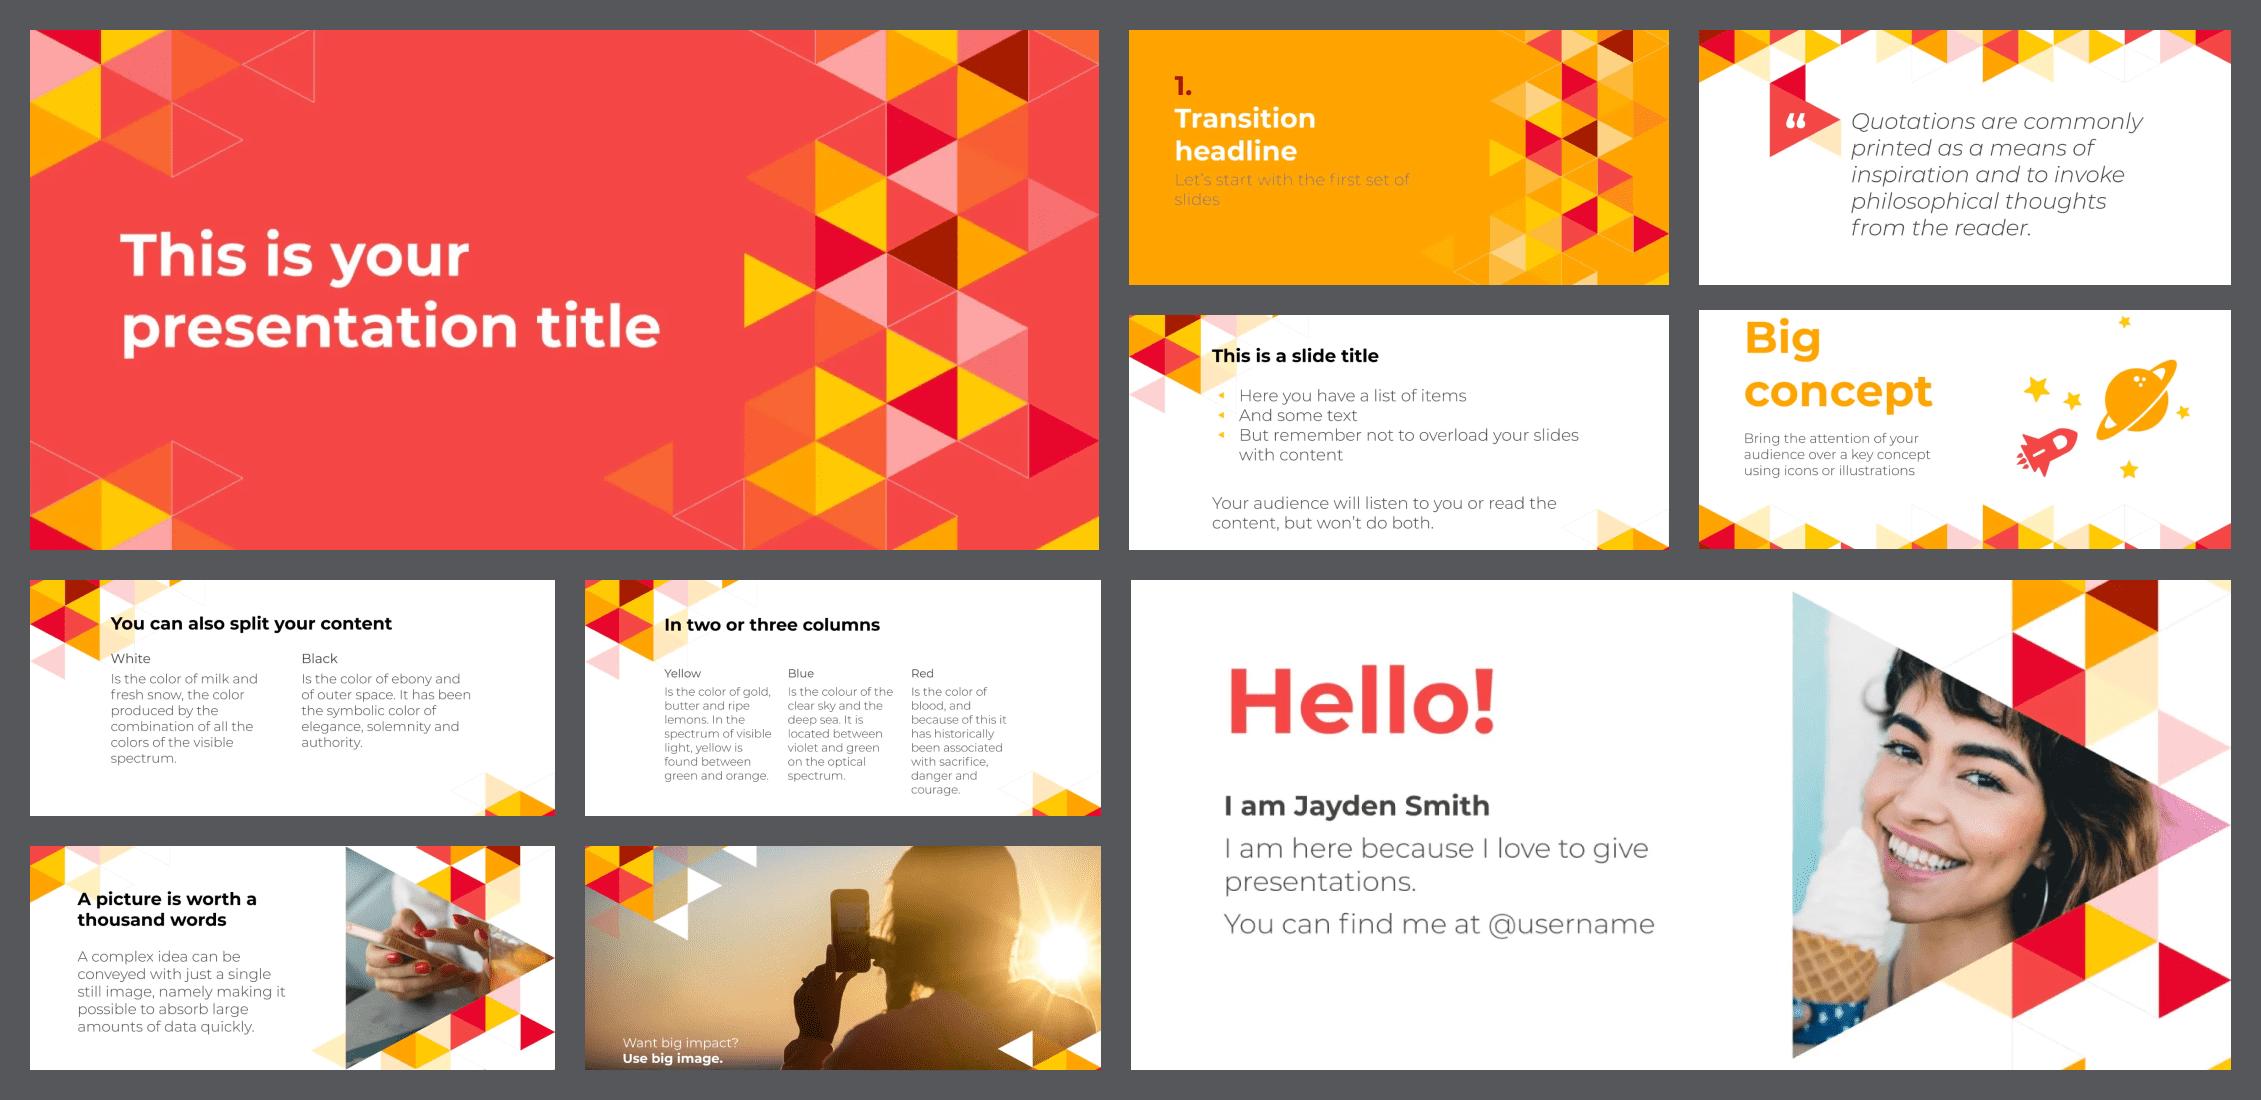 50+ Free and Premium Simple Google Slides Themes in 2021 - simple google slides theme 46